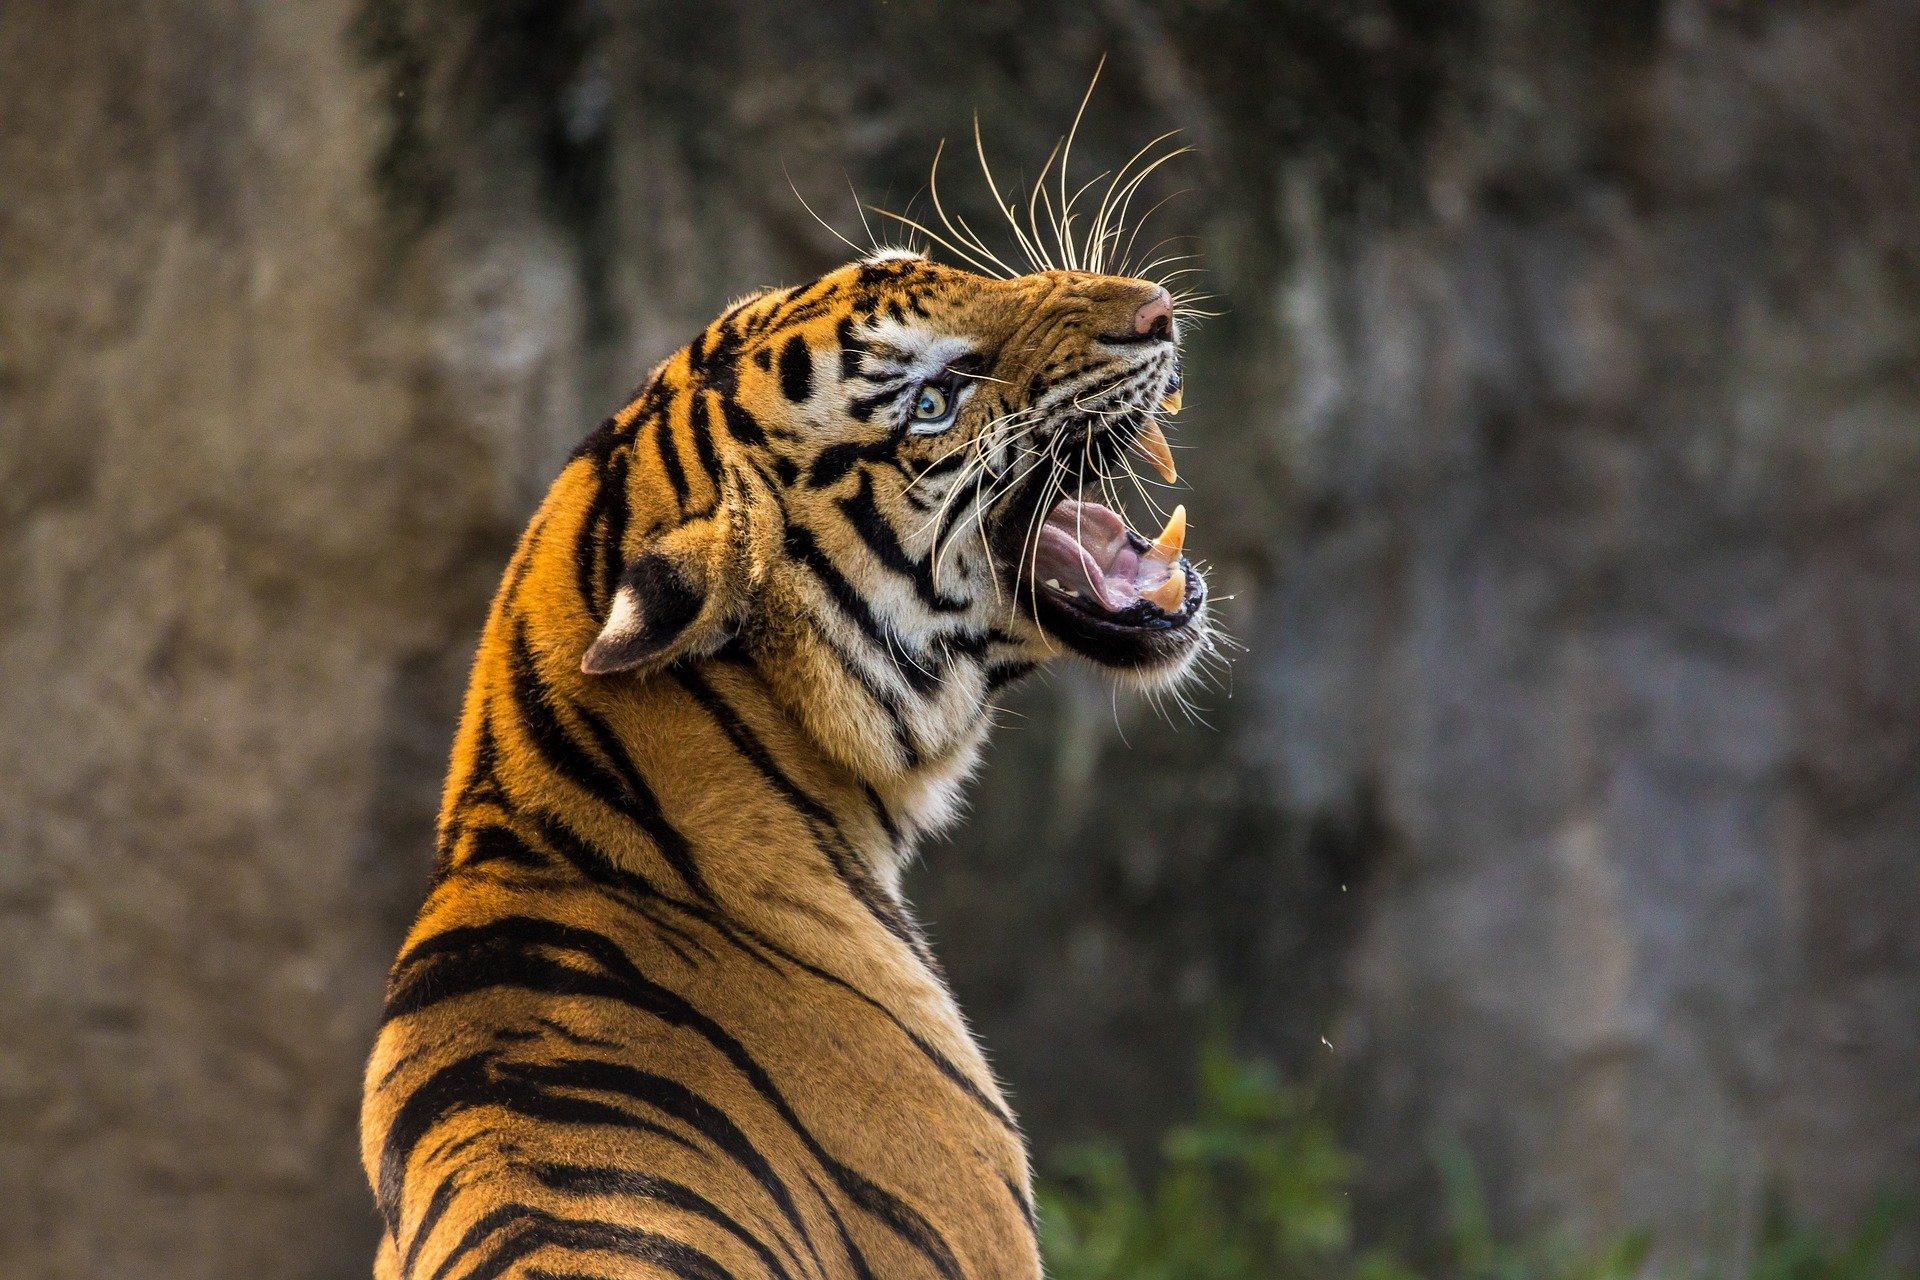 Should experimental coronavirus vaccine be tested on zoo animals?